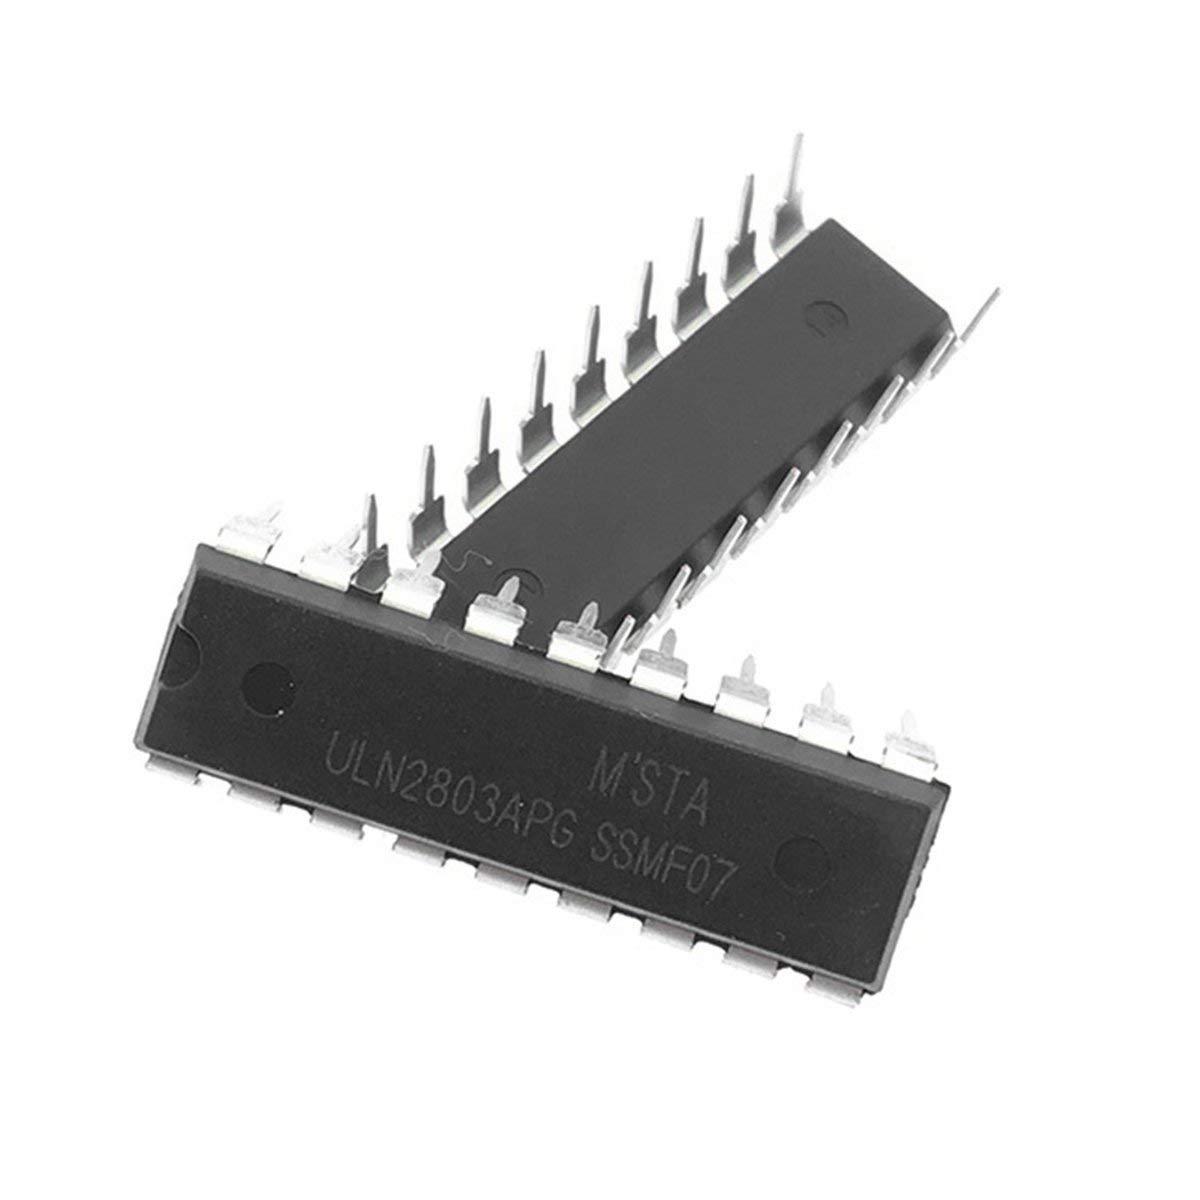 10pcs Uln2803a Uln2803 2803 Transistor Array-8 Npn Ic Durable Direct Insertion Darlington Drive 8 Channel